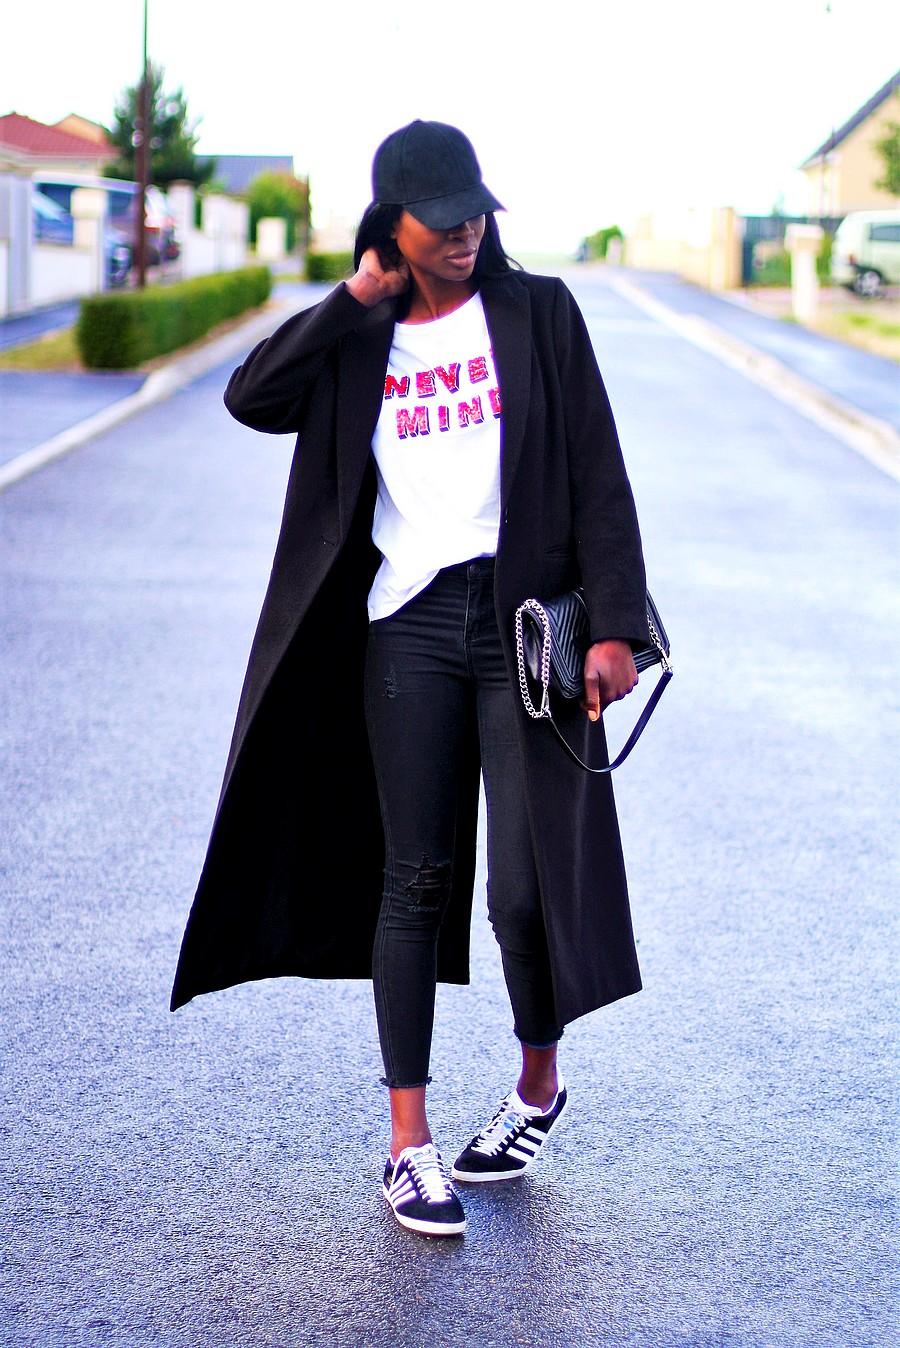 casquette-manteau-long-sac-rebecca-minkoff-jeans-dechire-adidas-gazelle